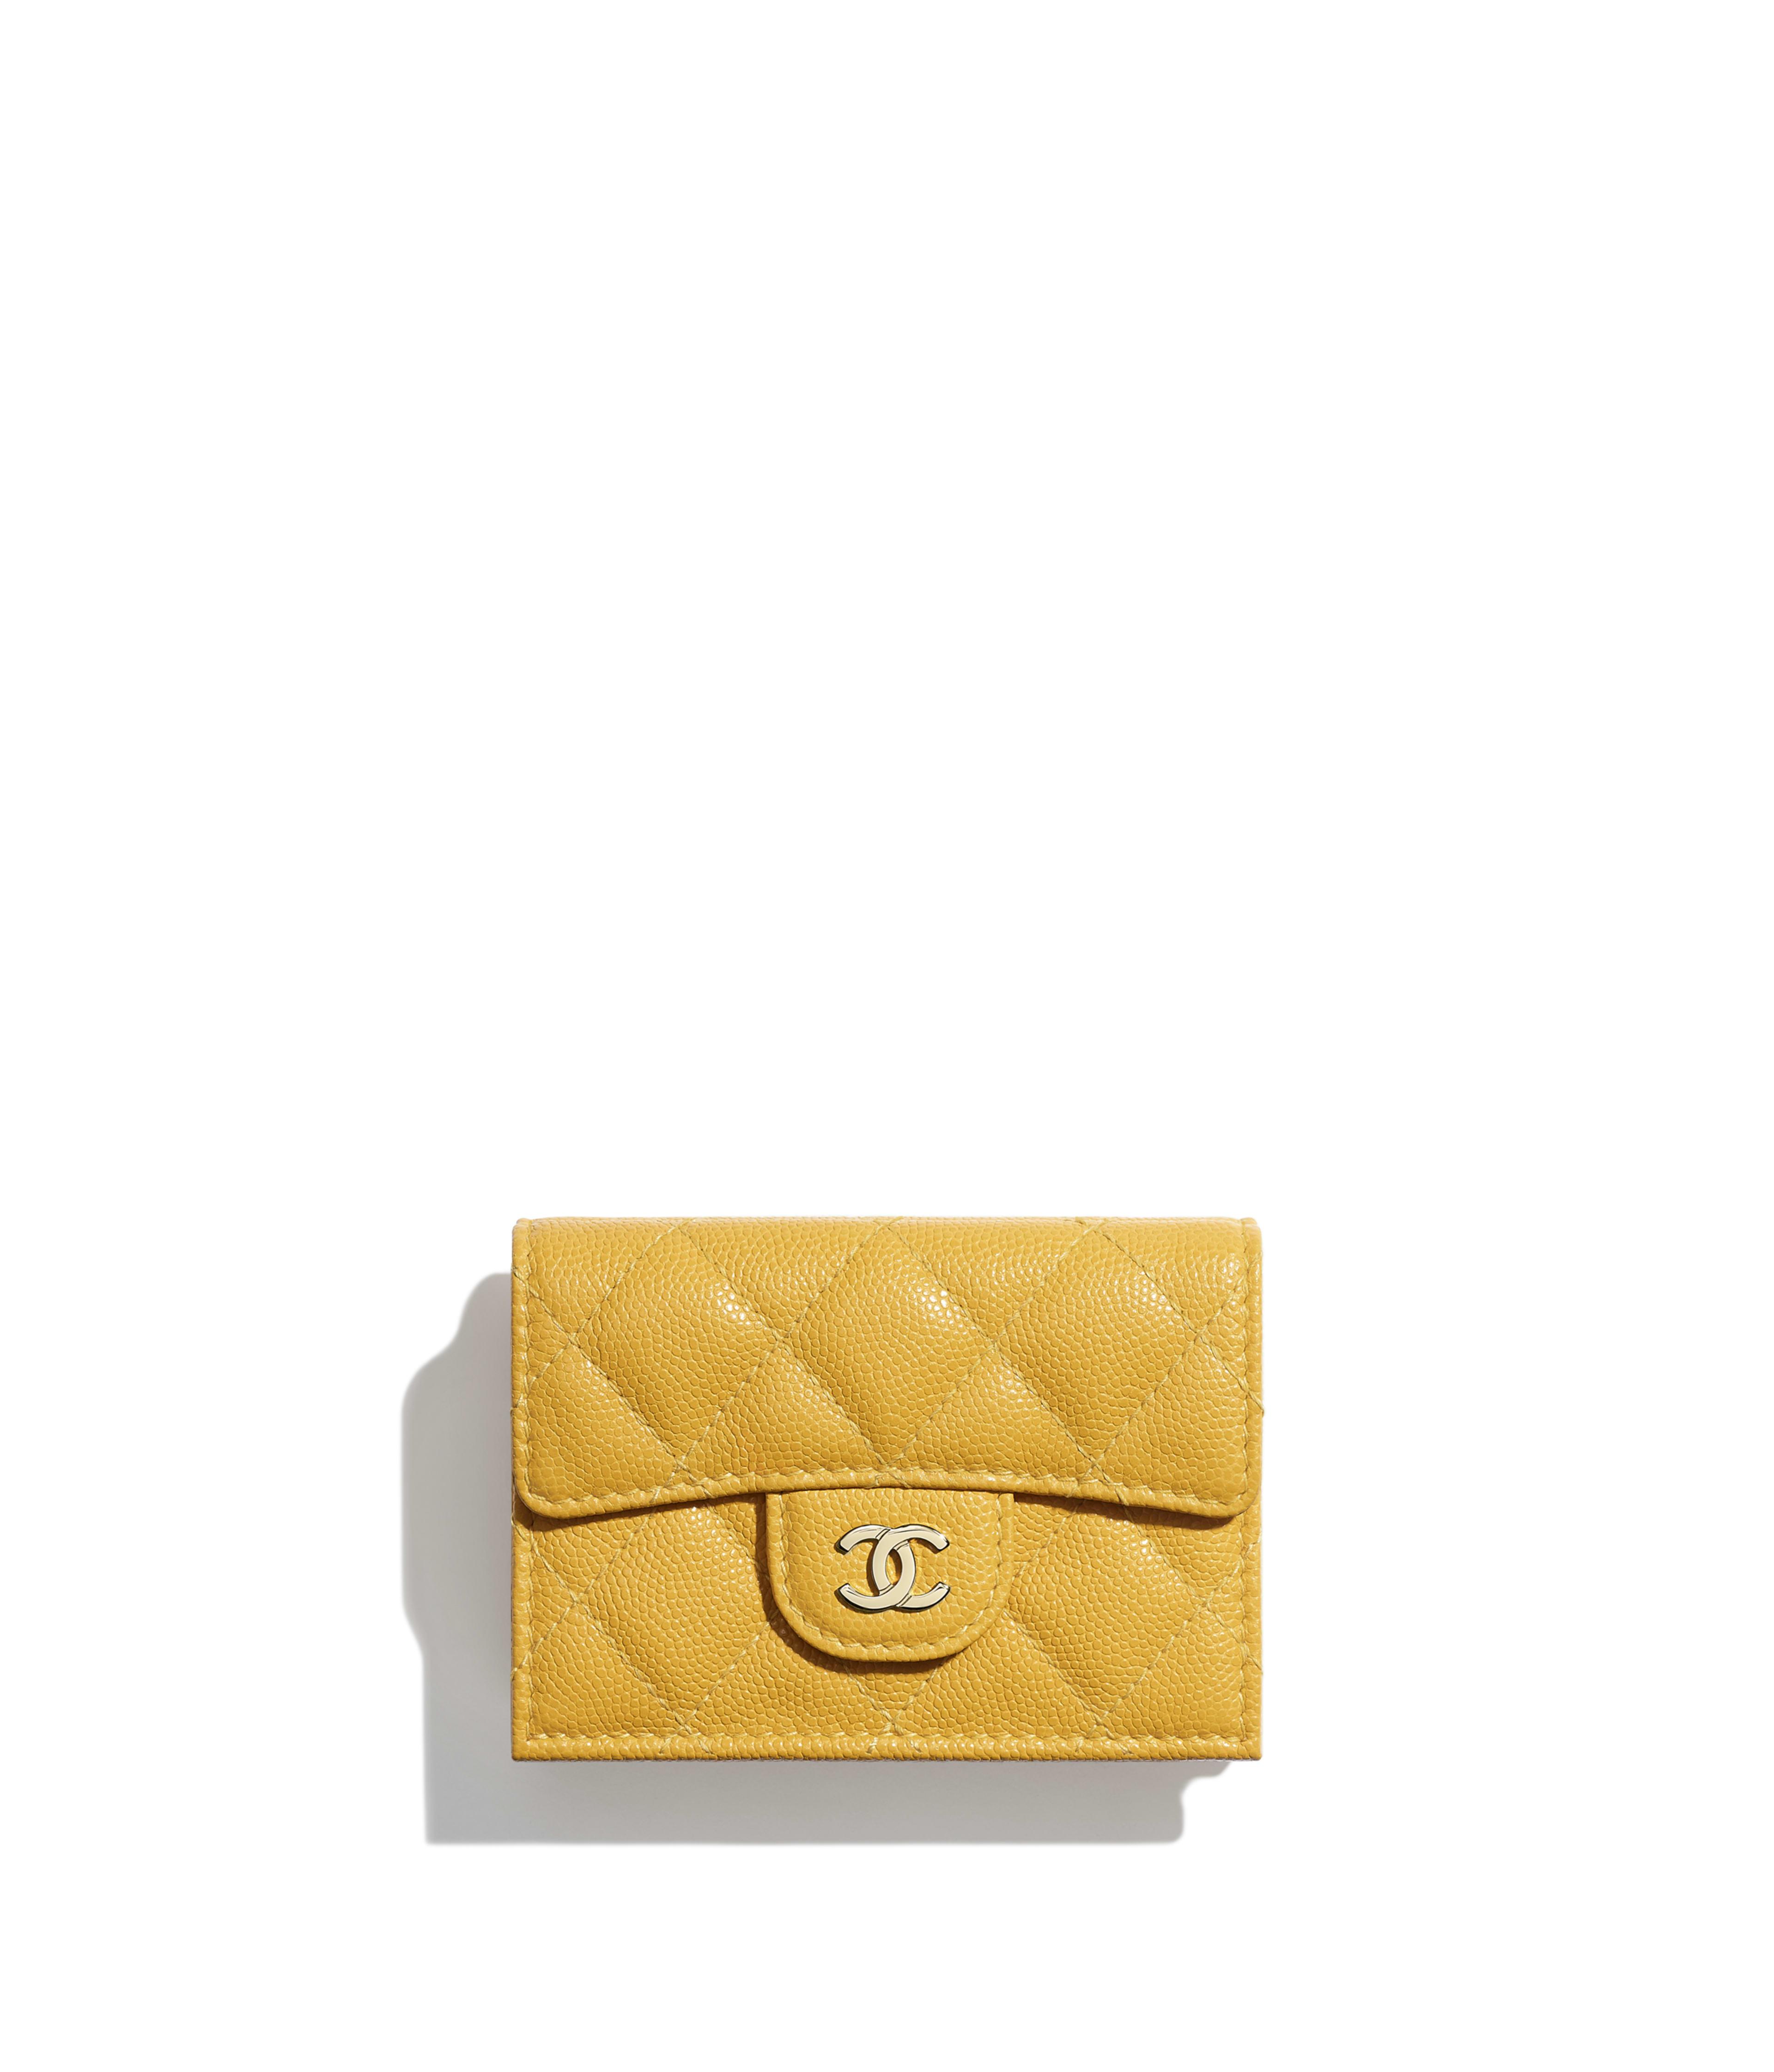 65d74f8bb9c5 Classic Small Flap Wallet Grained Calfskin   Gold-Tone Metal